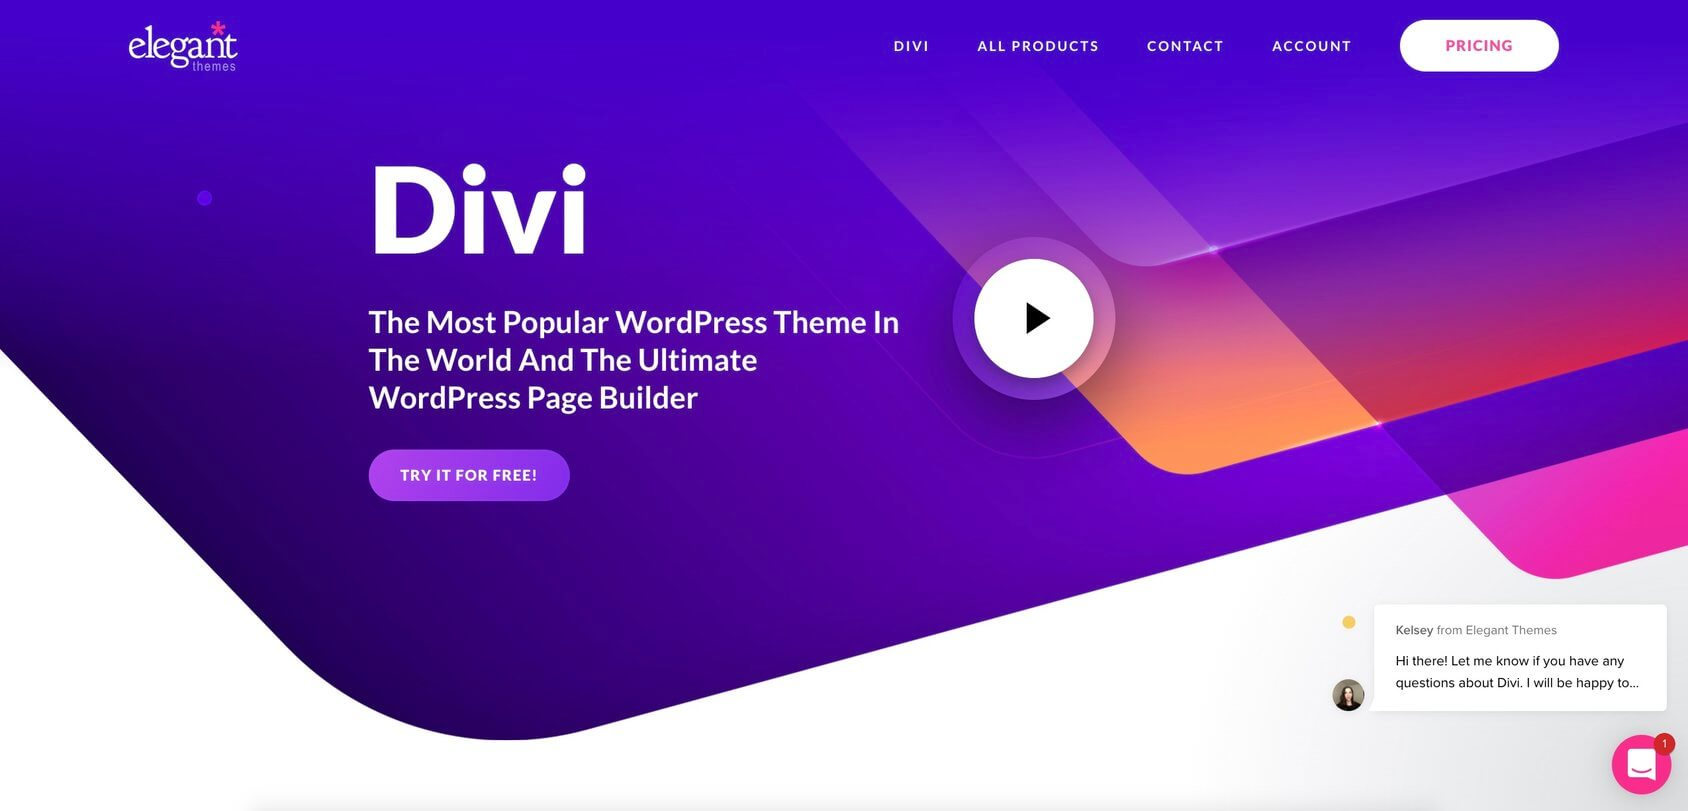 Divi ElegantThemes homepage